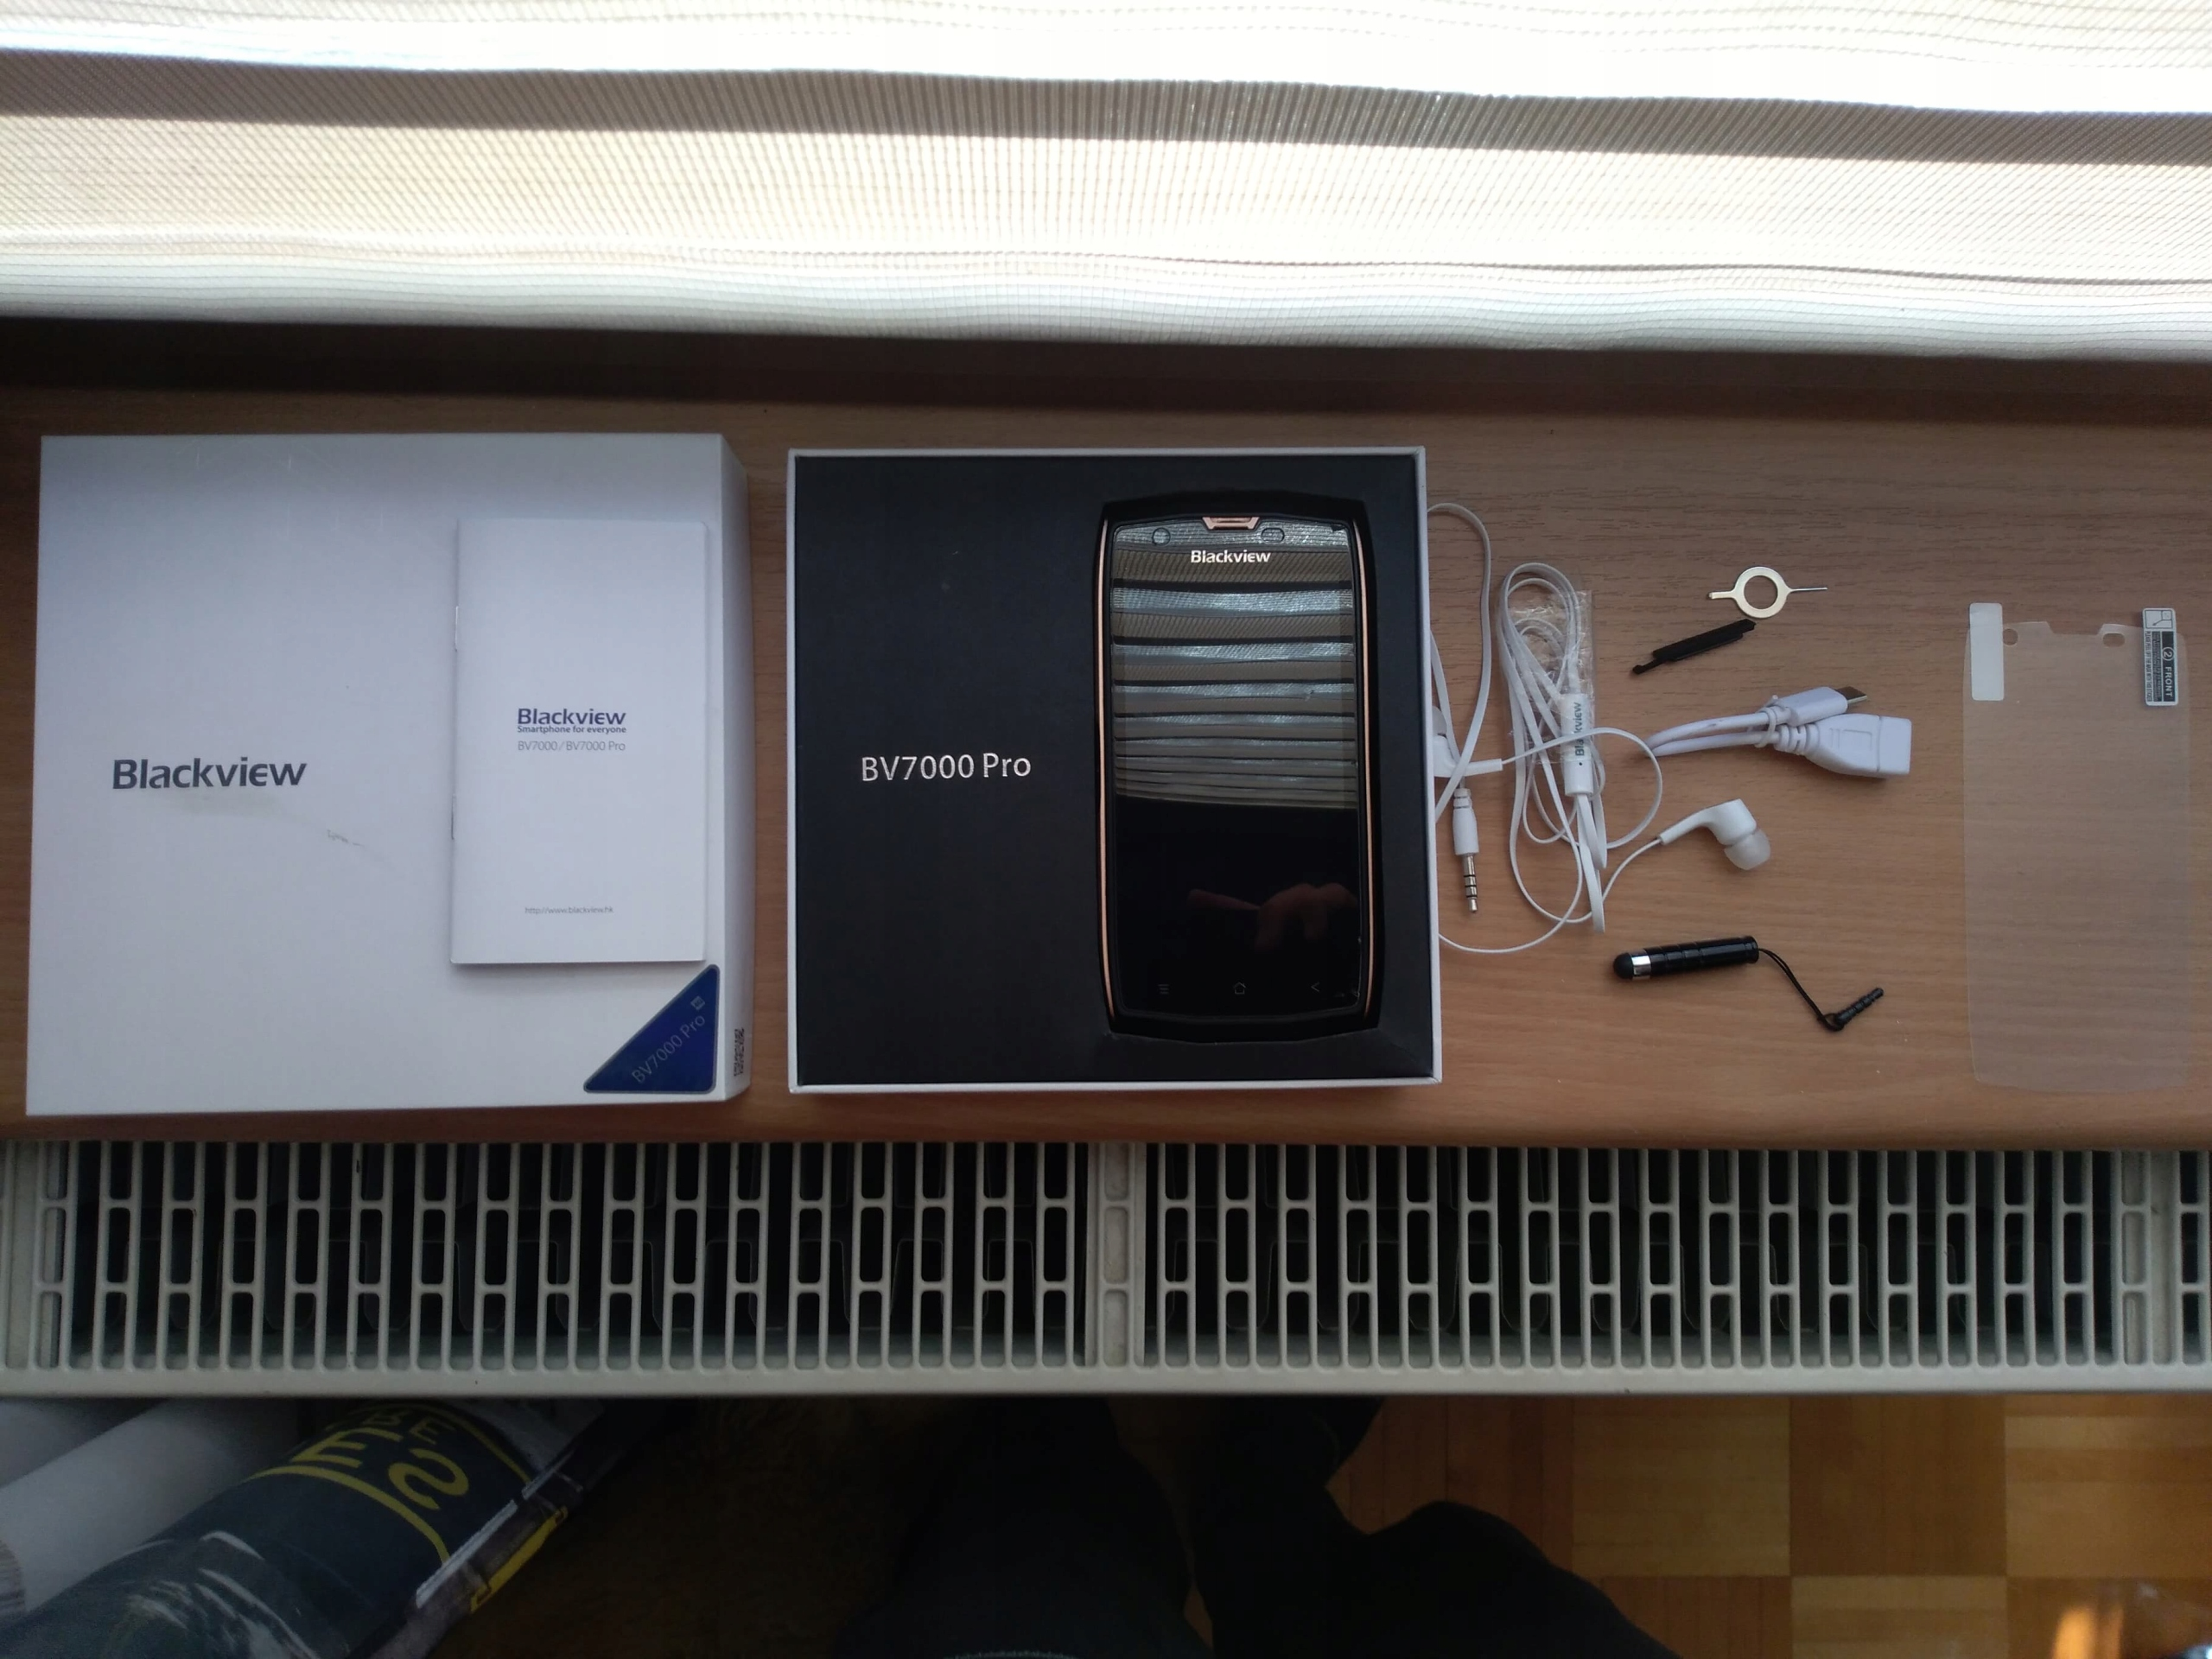 Blackview bv7000 pro 4/64 GB używany!